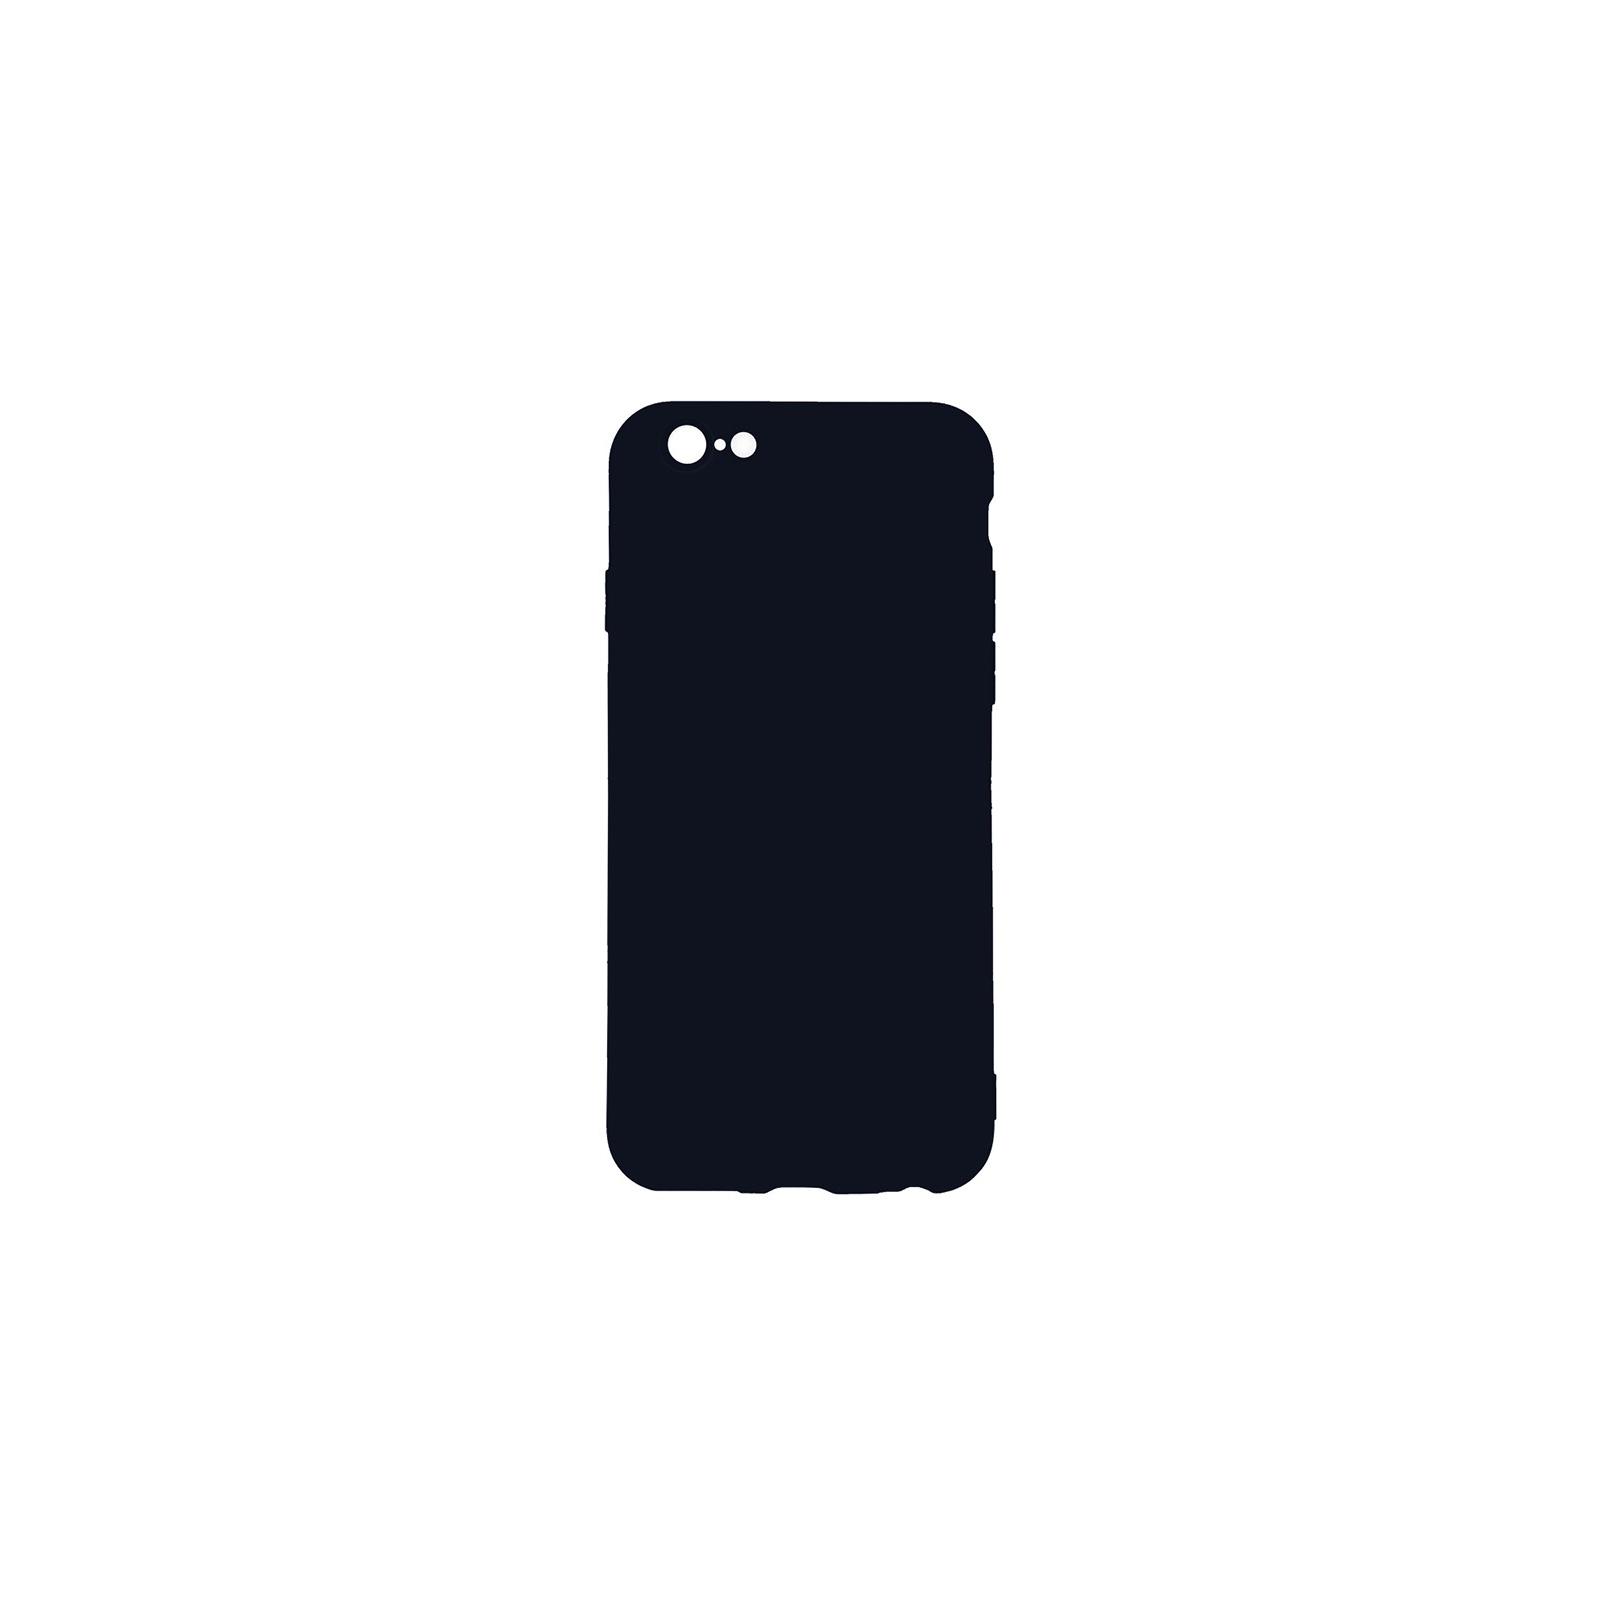 Чехол для моб. телефона Toto 1mm Matt TPU Case Apple iPhone 6/6s Black (F_93931)